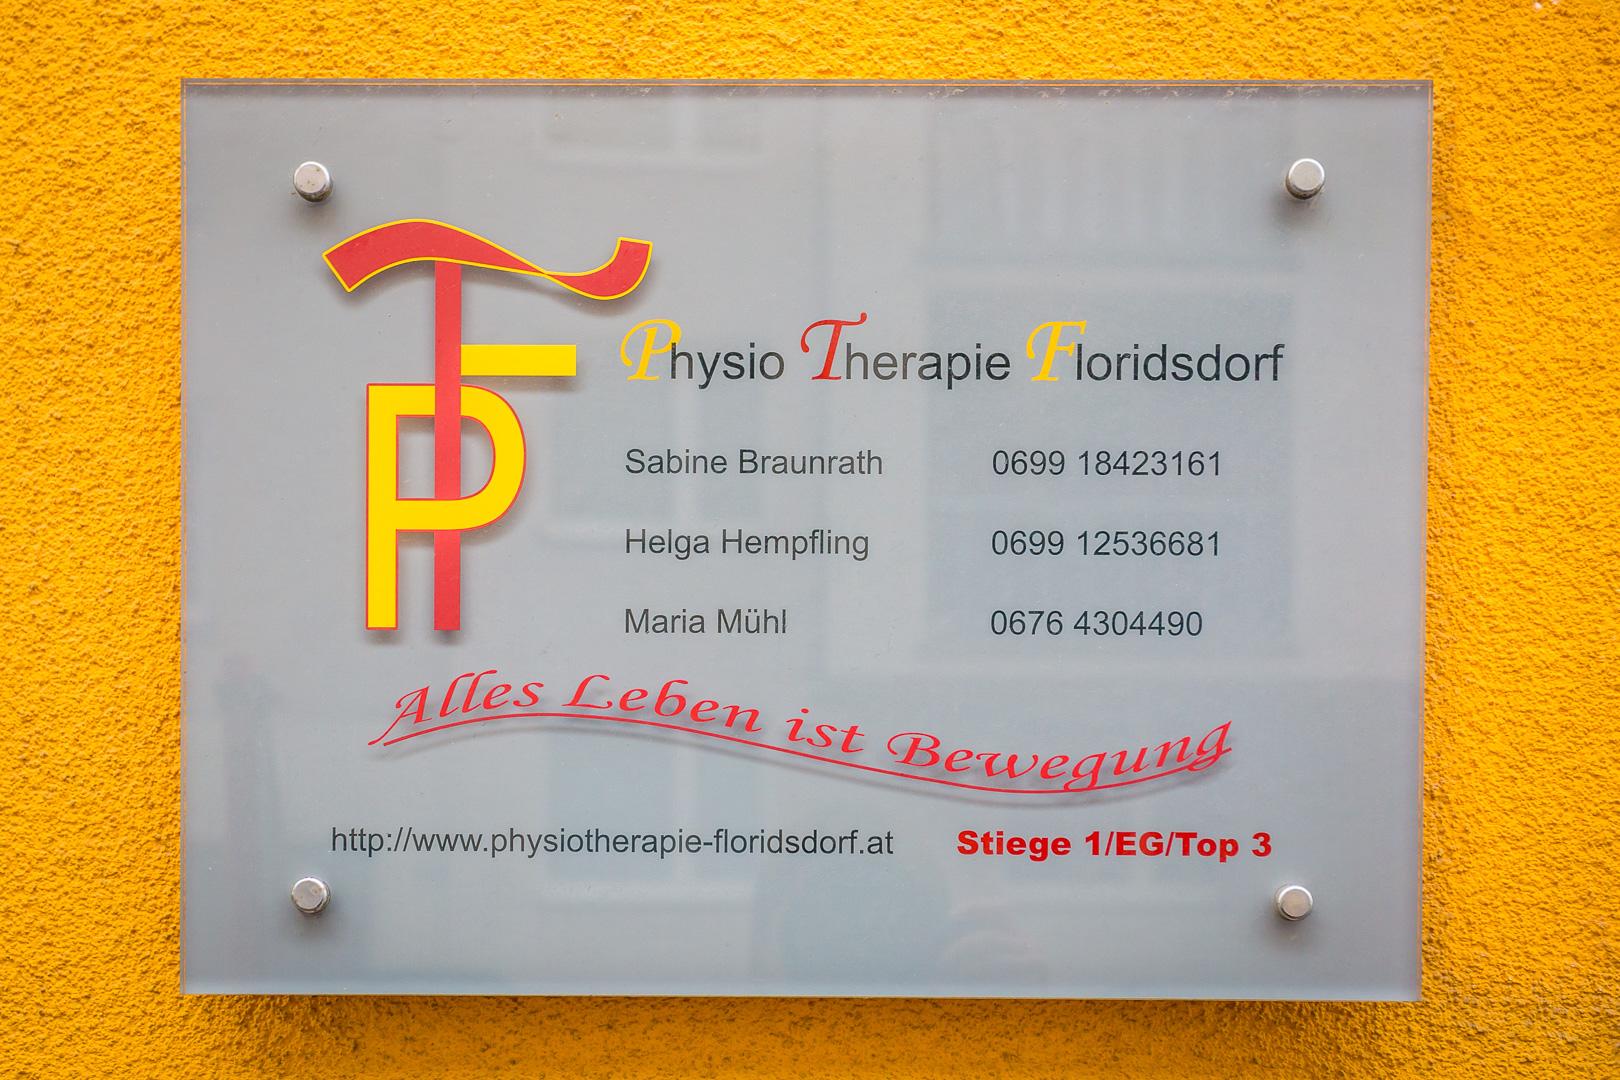 2019_05_22 Praxisraeume Physiotherapie Floridsdorf web 064